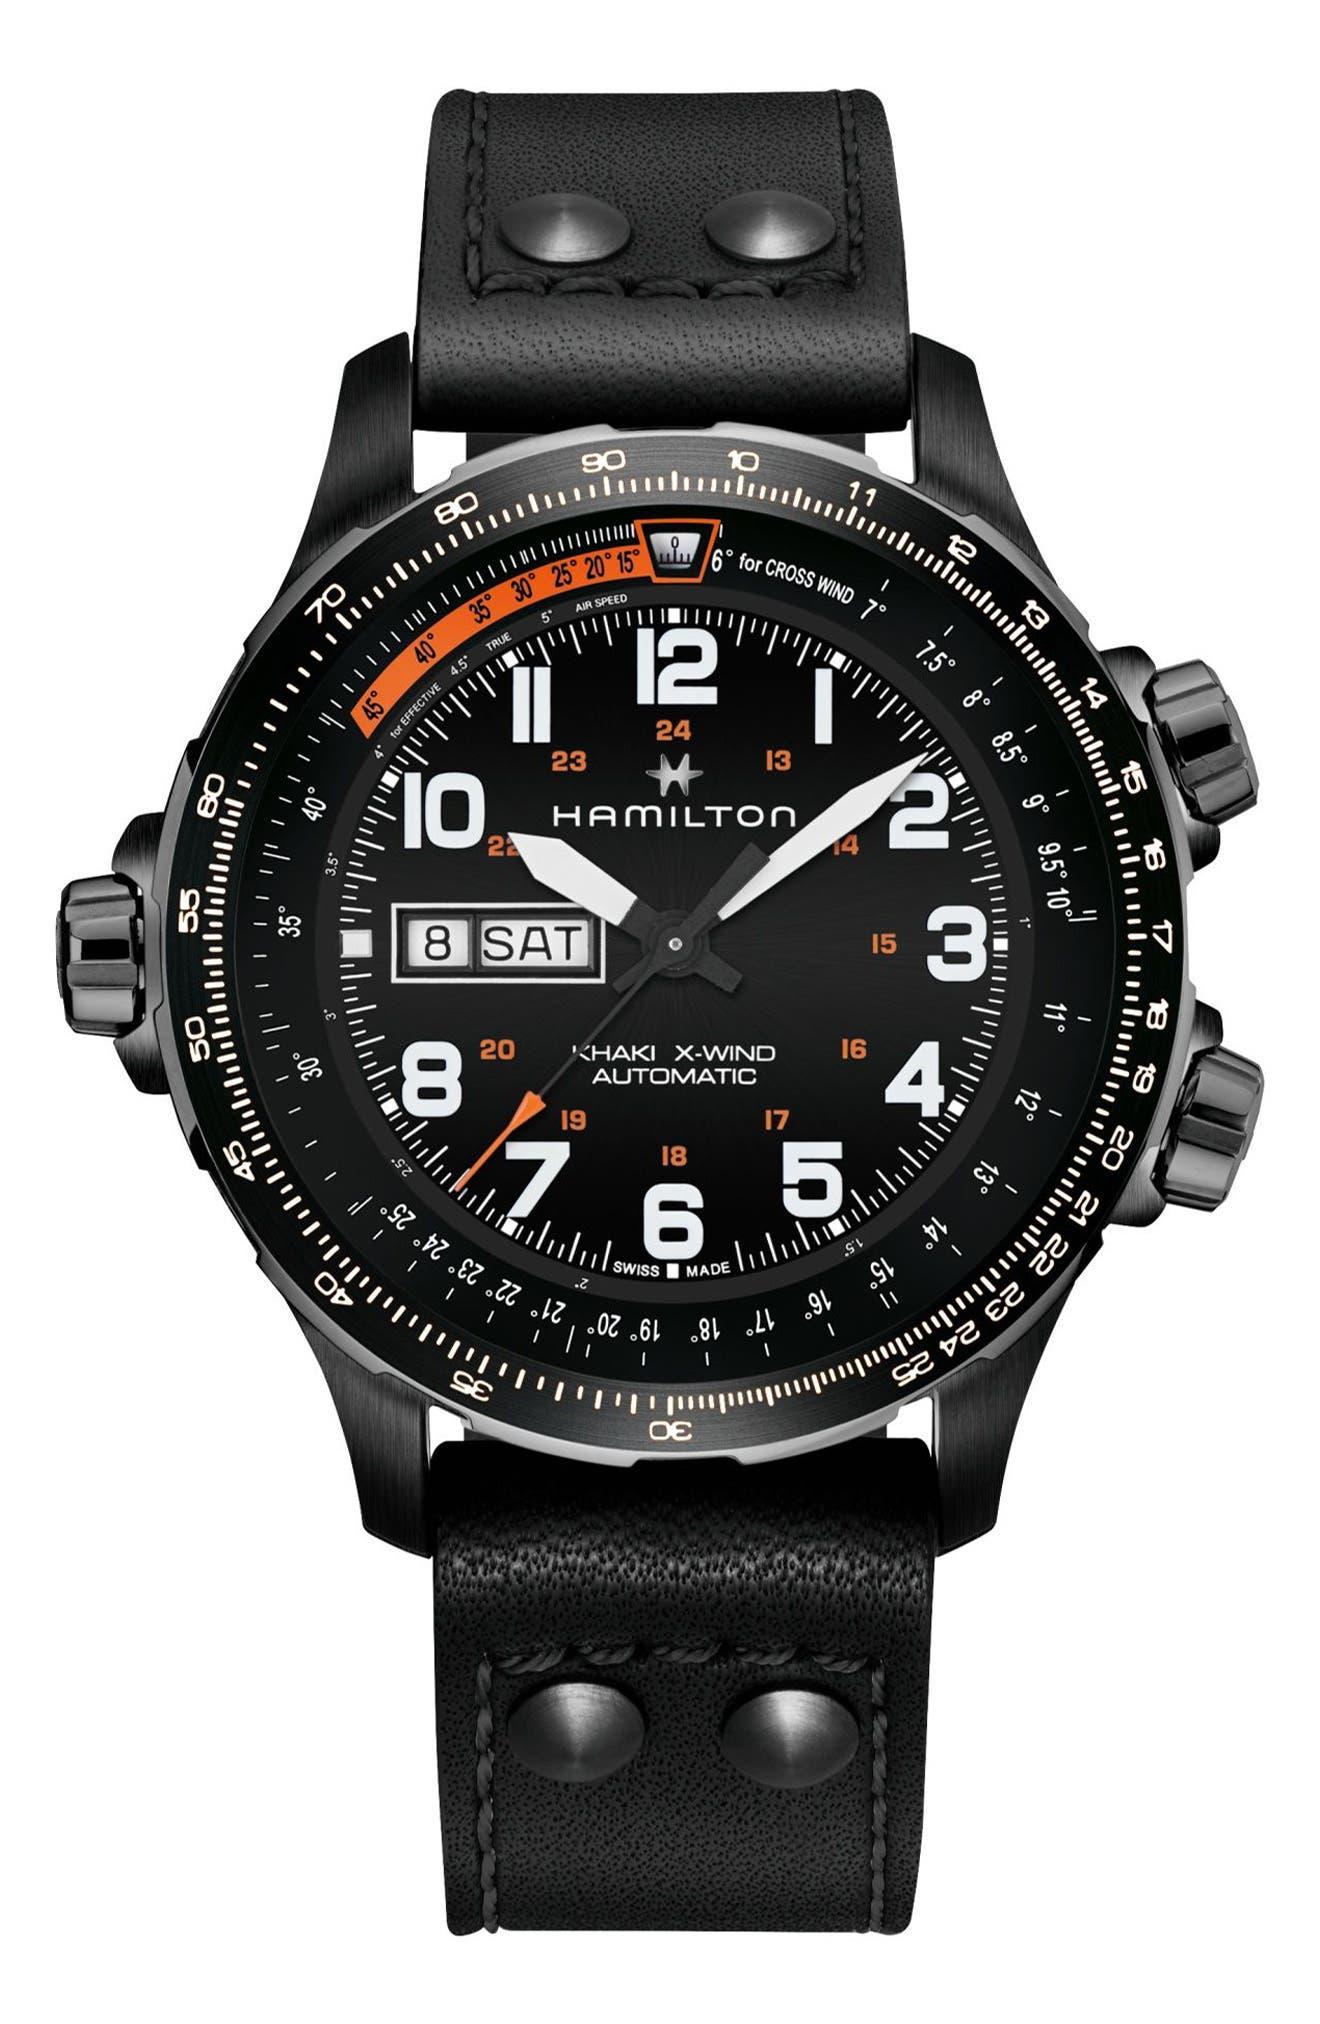 Hamilton Khaki X-Wind Automatic Chronograph Leather Strap Watch, 45mm